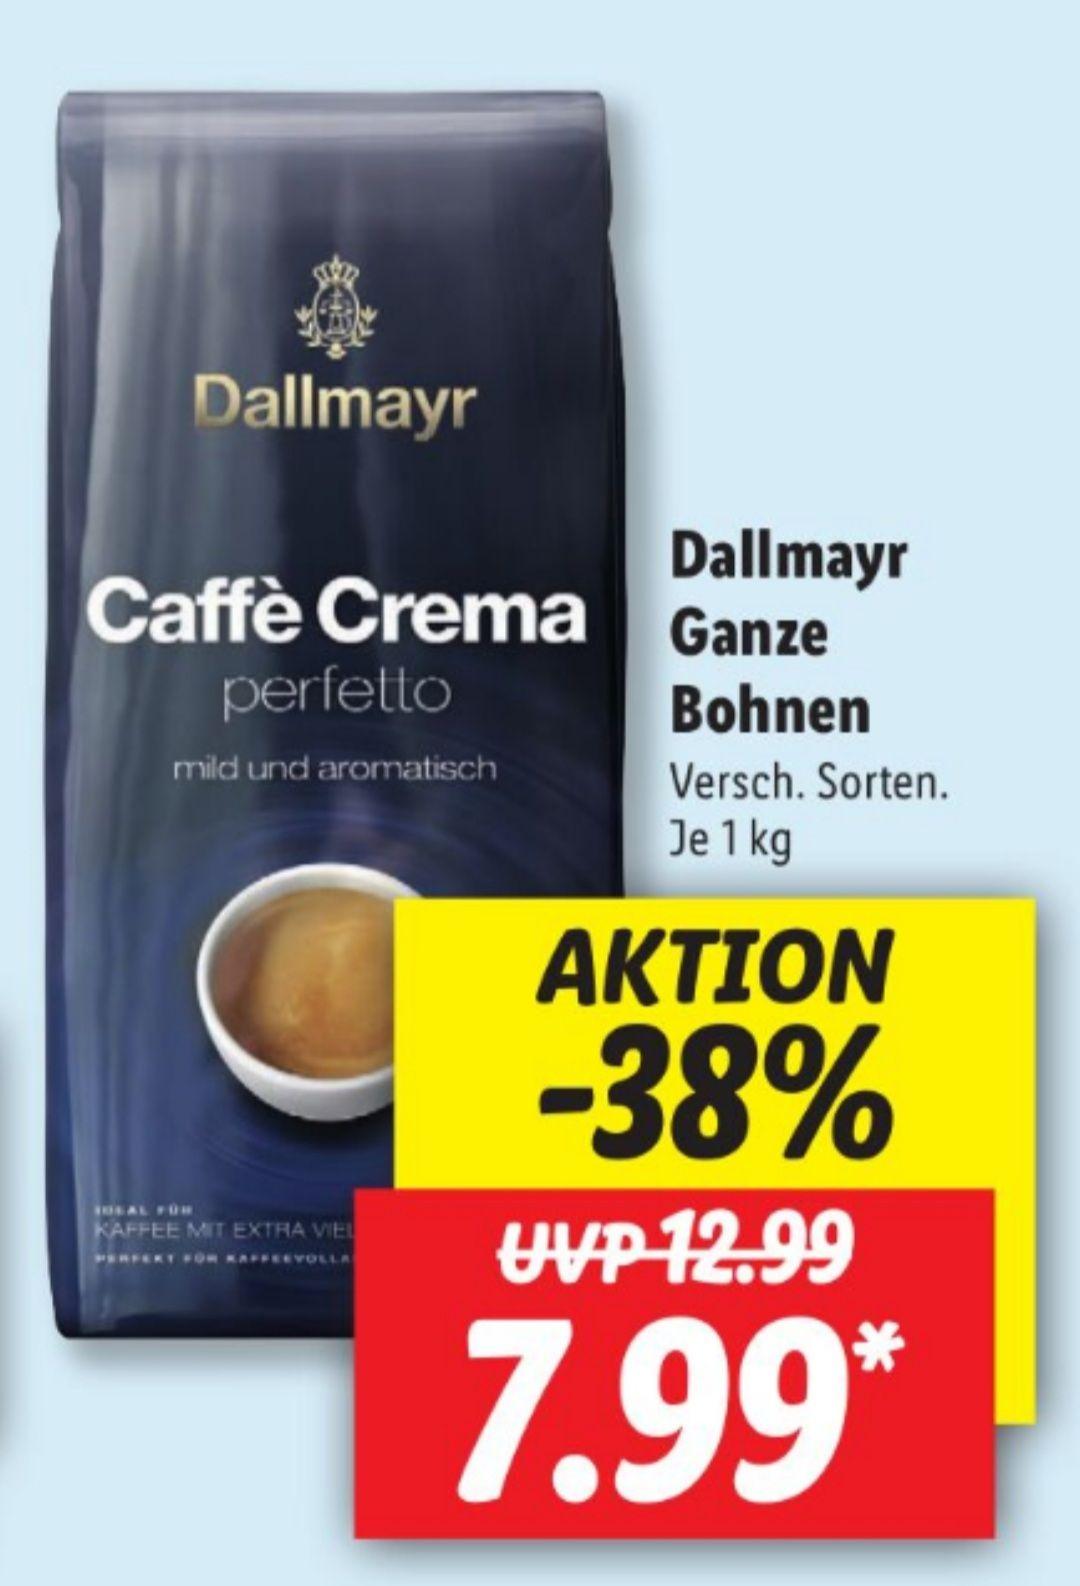 Dallmayr Ganze Bohnen 1 Kg 7,99€ statt 12,99€ UND Olivenöl Extra 500 ml 2,29€ statt 2,68€ Lidl ab 03.05